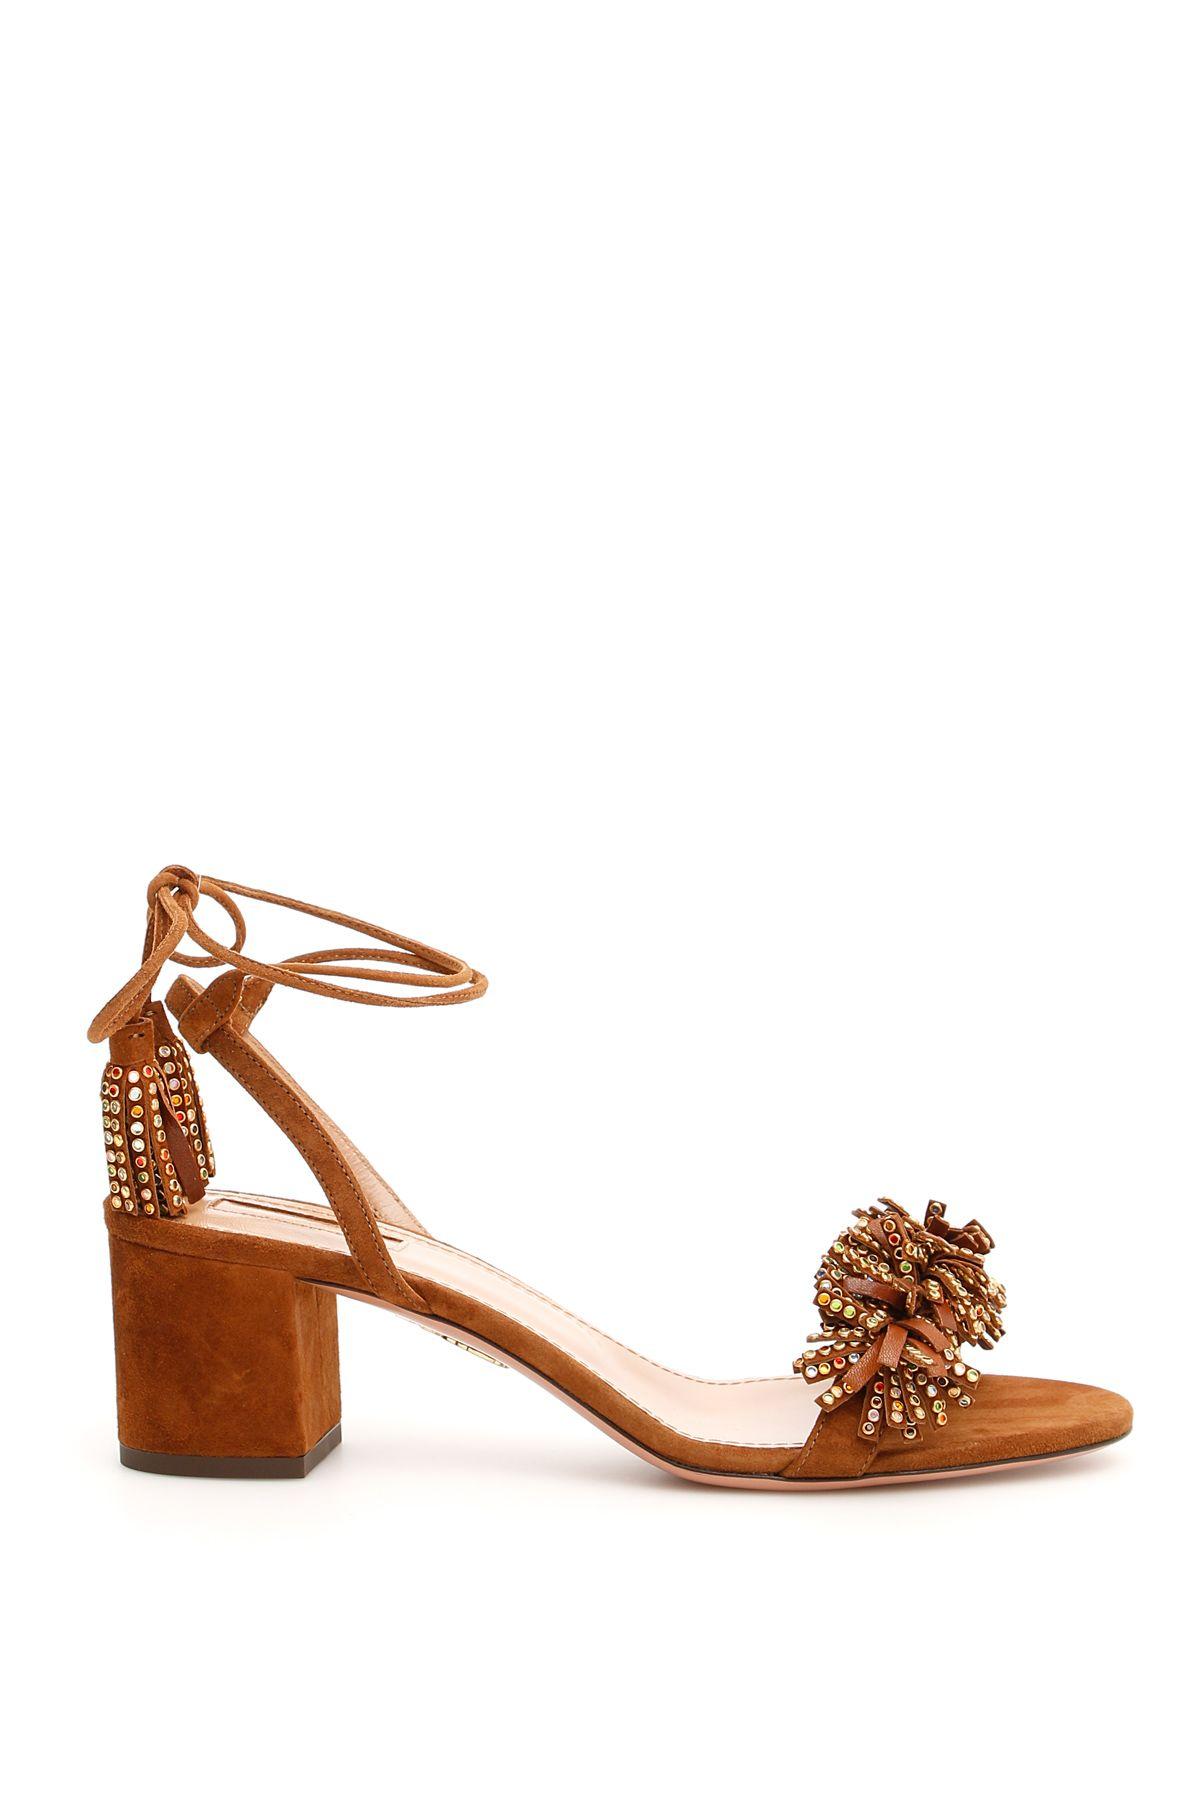 4b58ce79c Aquazzura Wild Crystal Sandals 50 In Cinnamon